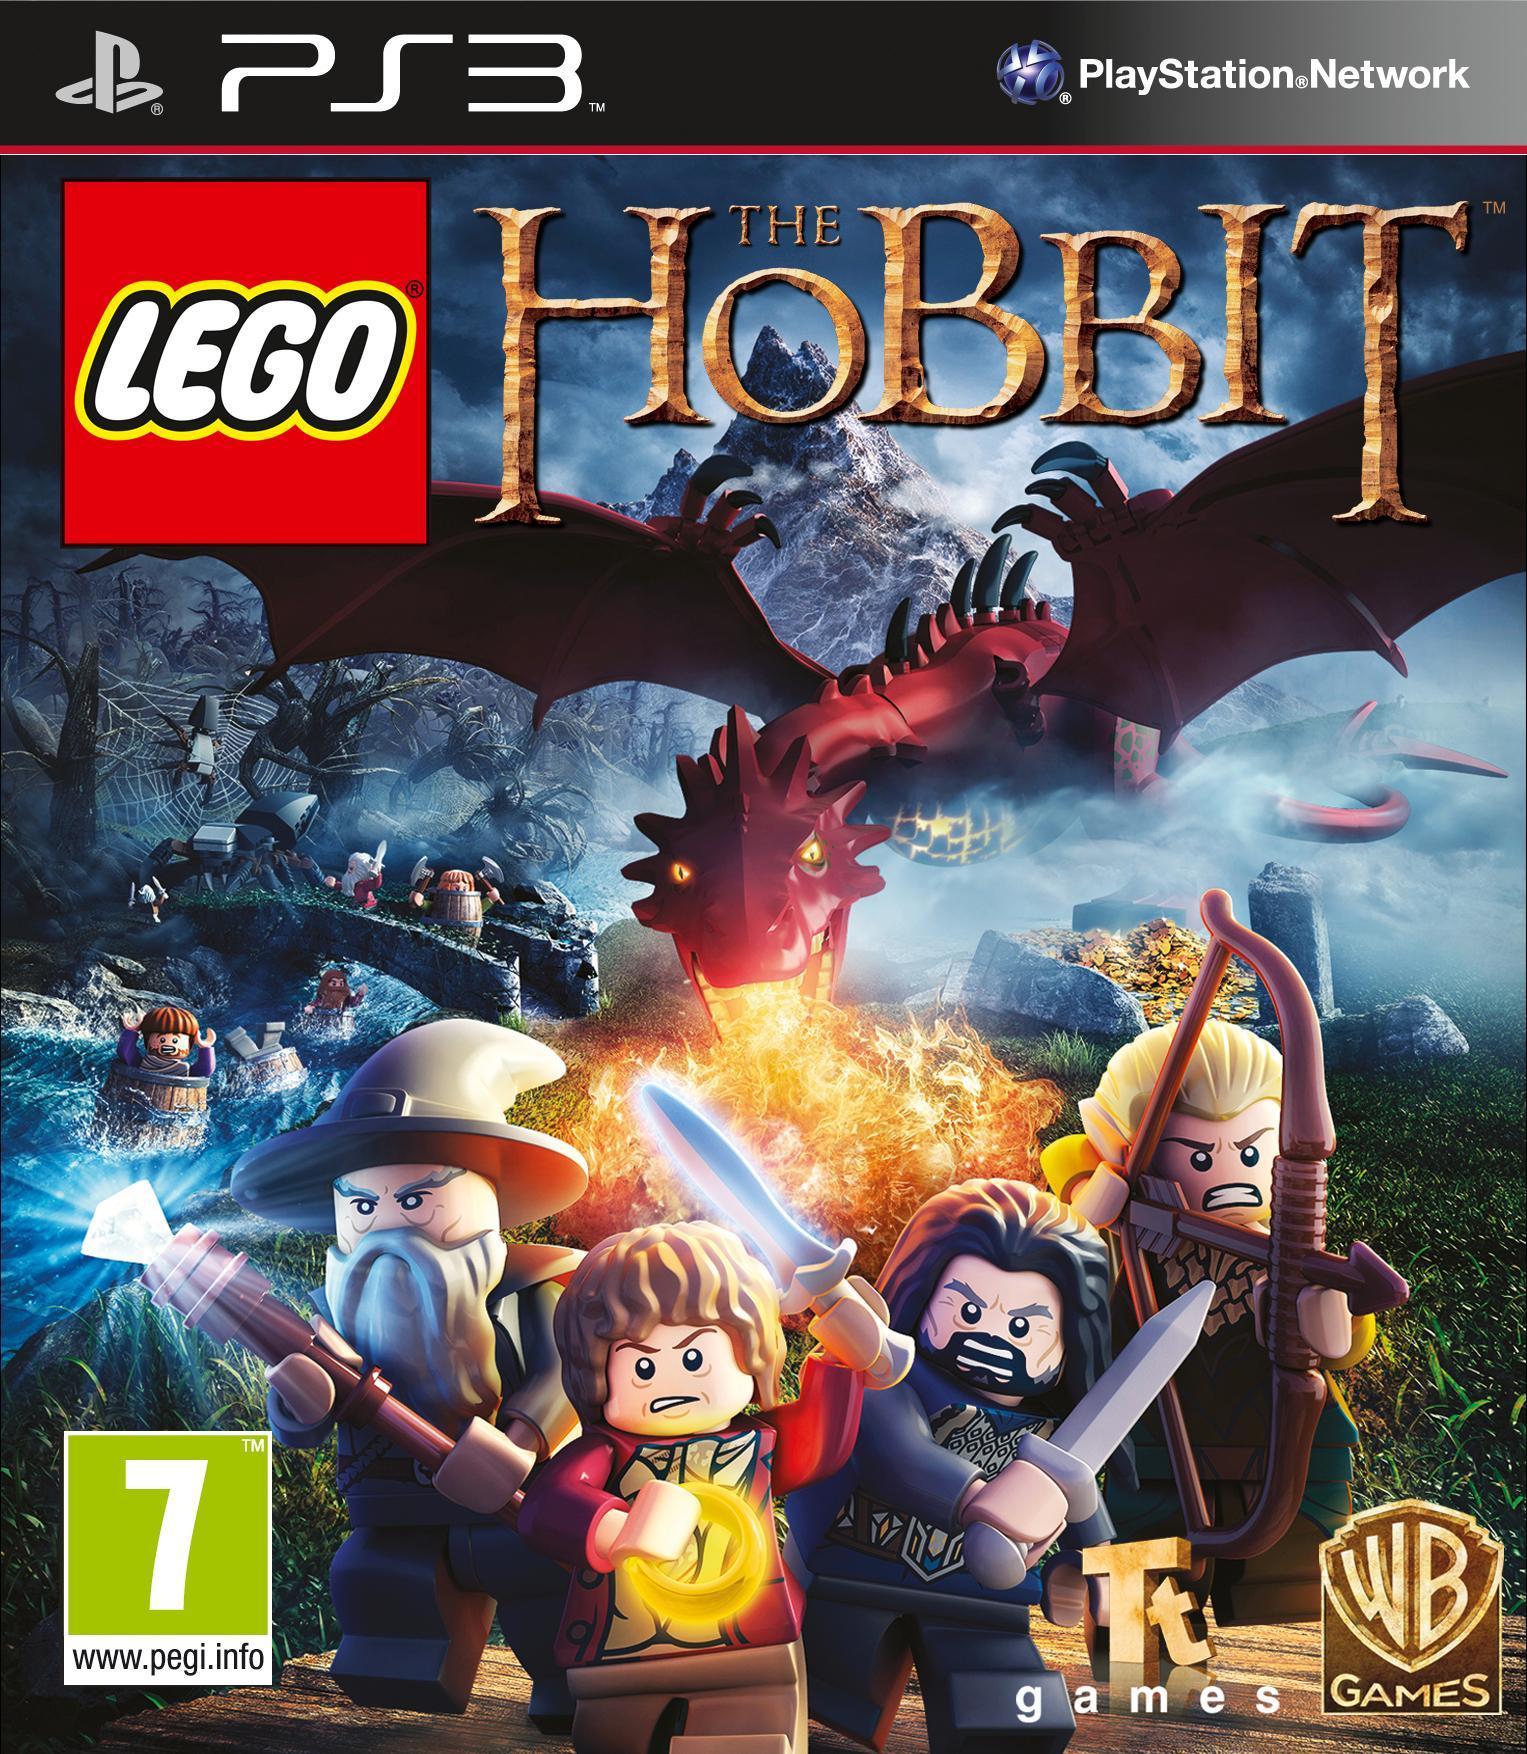 Warner Bros LEGO Hobbit PS3 (1000452218) thumbnail